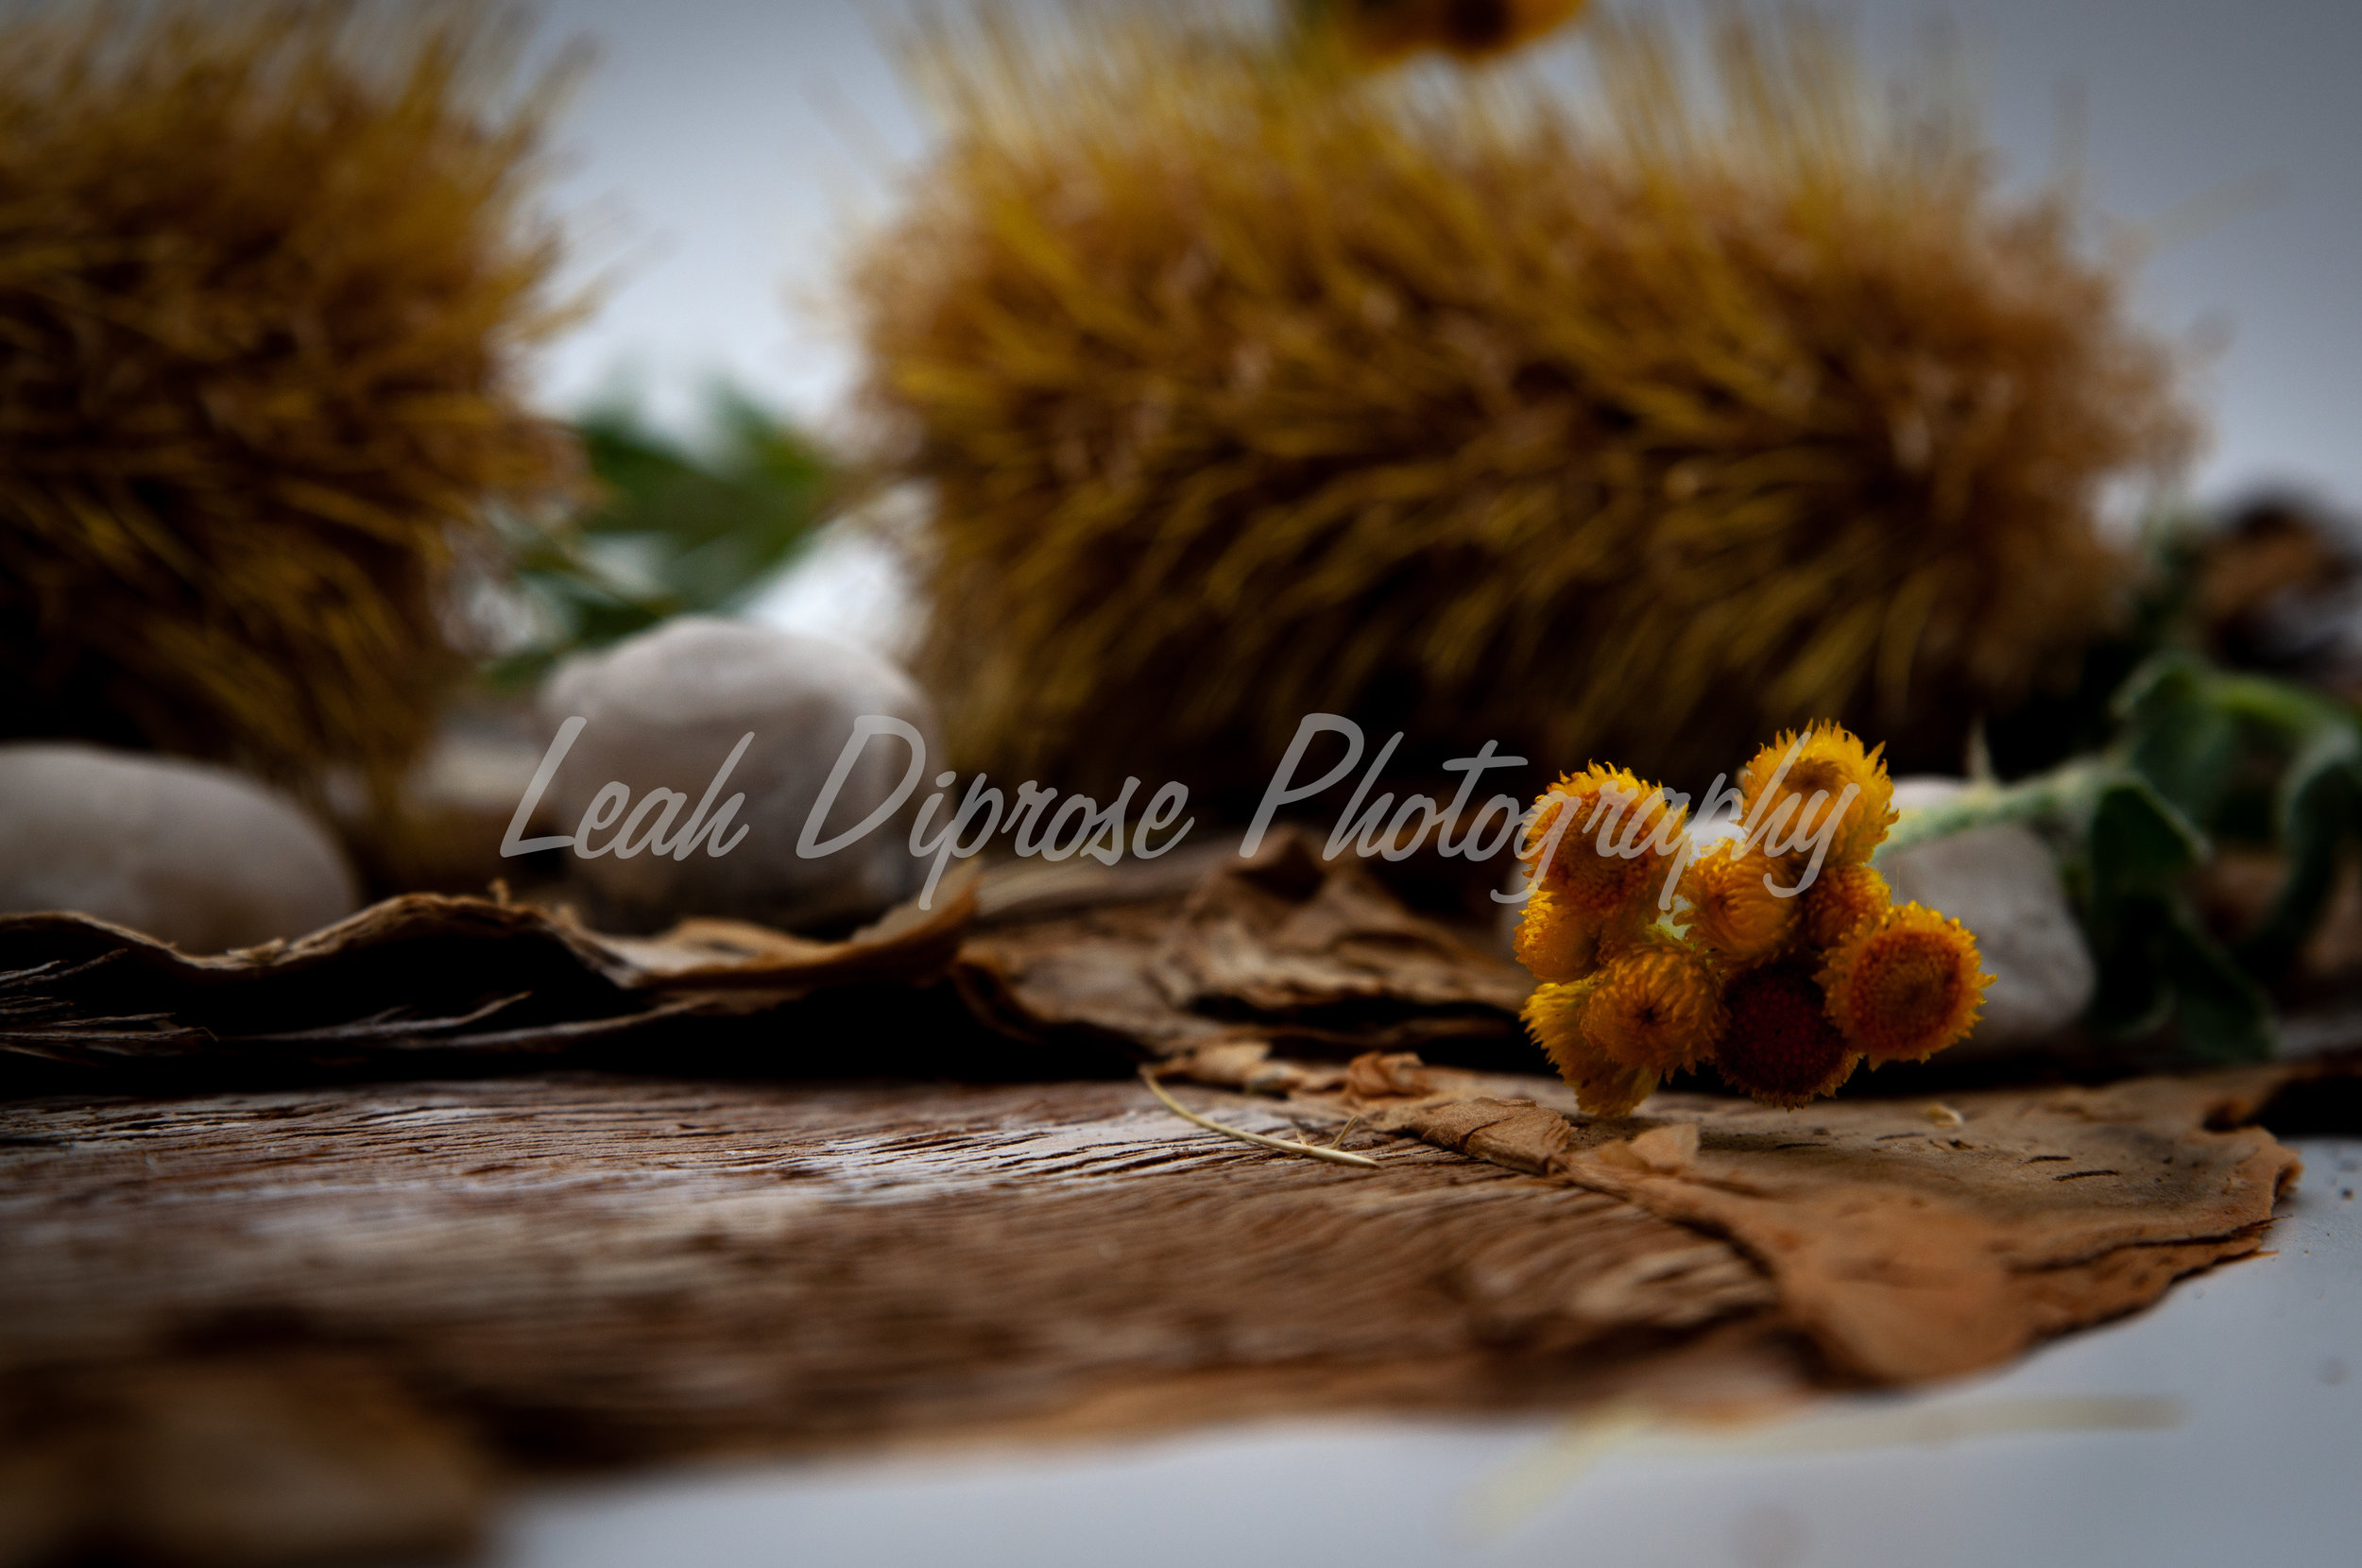 Leah Diprose Photography image-1581.jpg